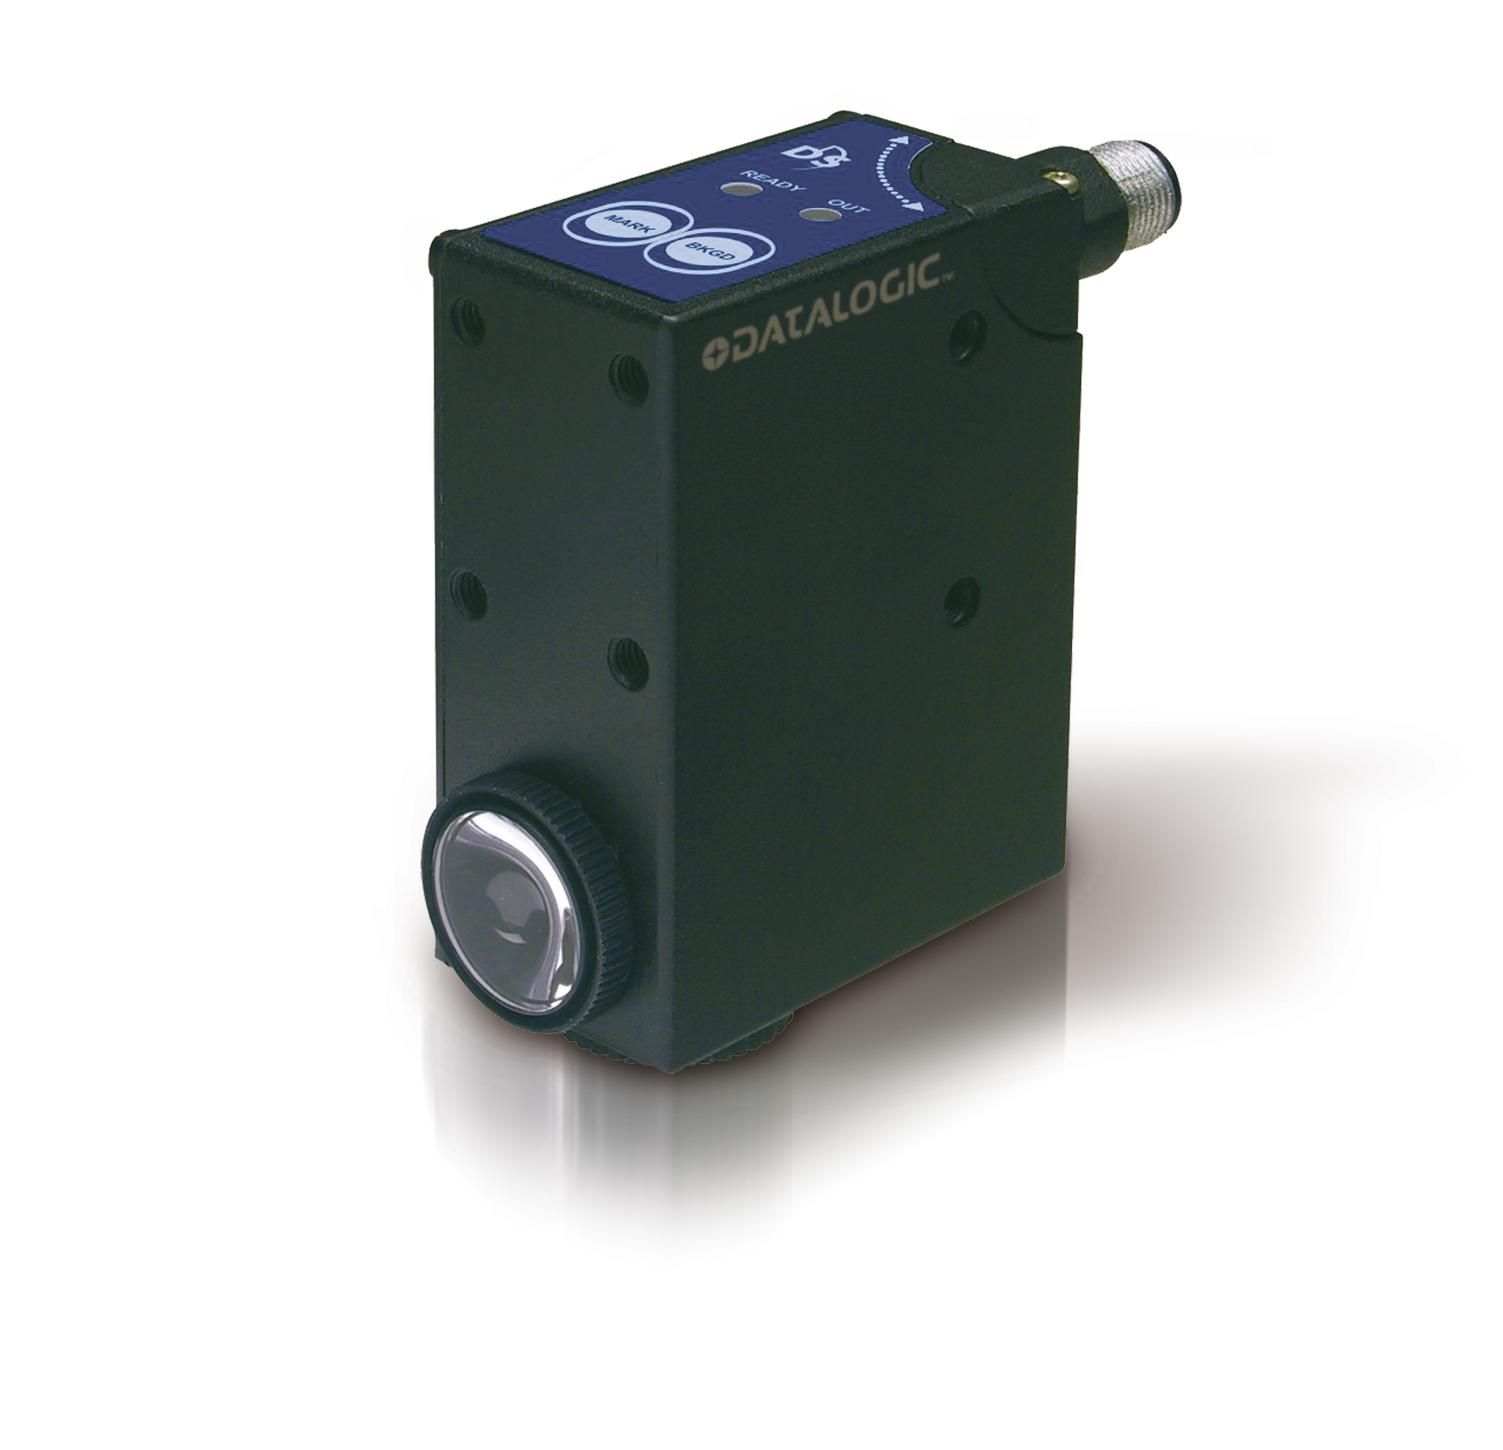 DATALOGIC TLu-015 zasięg 6-12mm, NPN, konektor M12/4pin, 10-30V – czujnik kontrastu